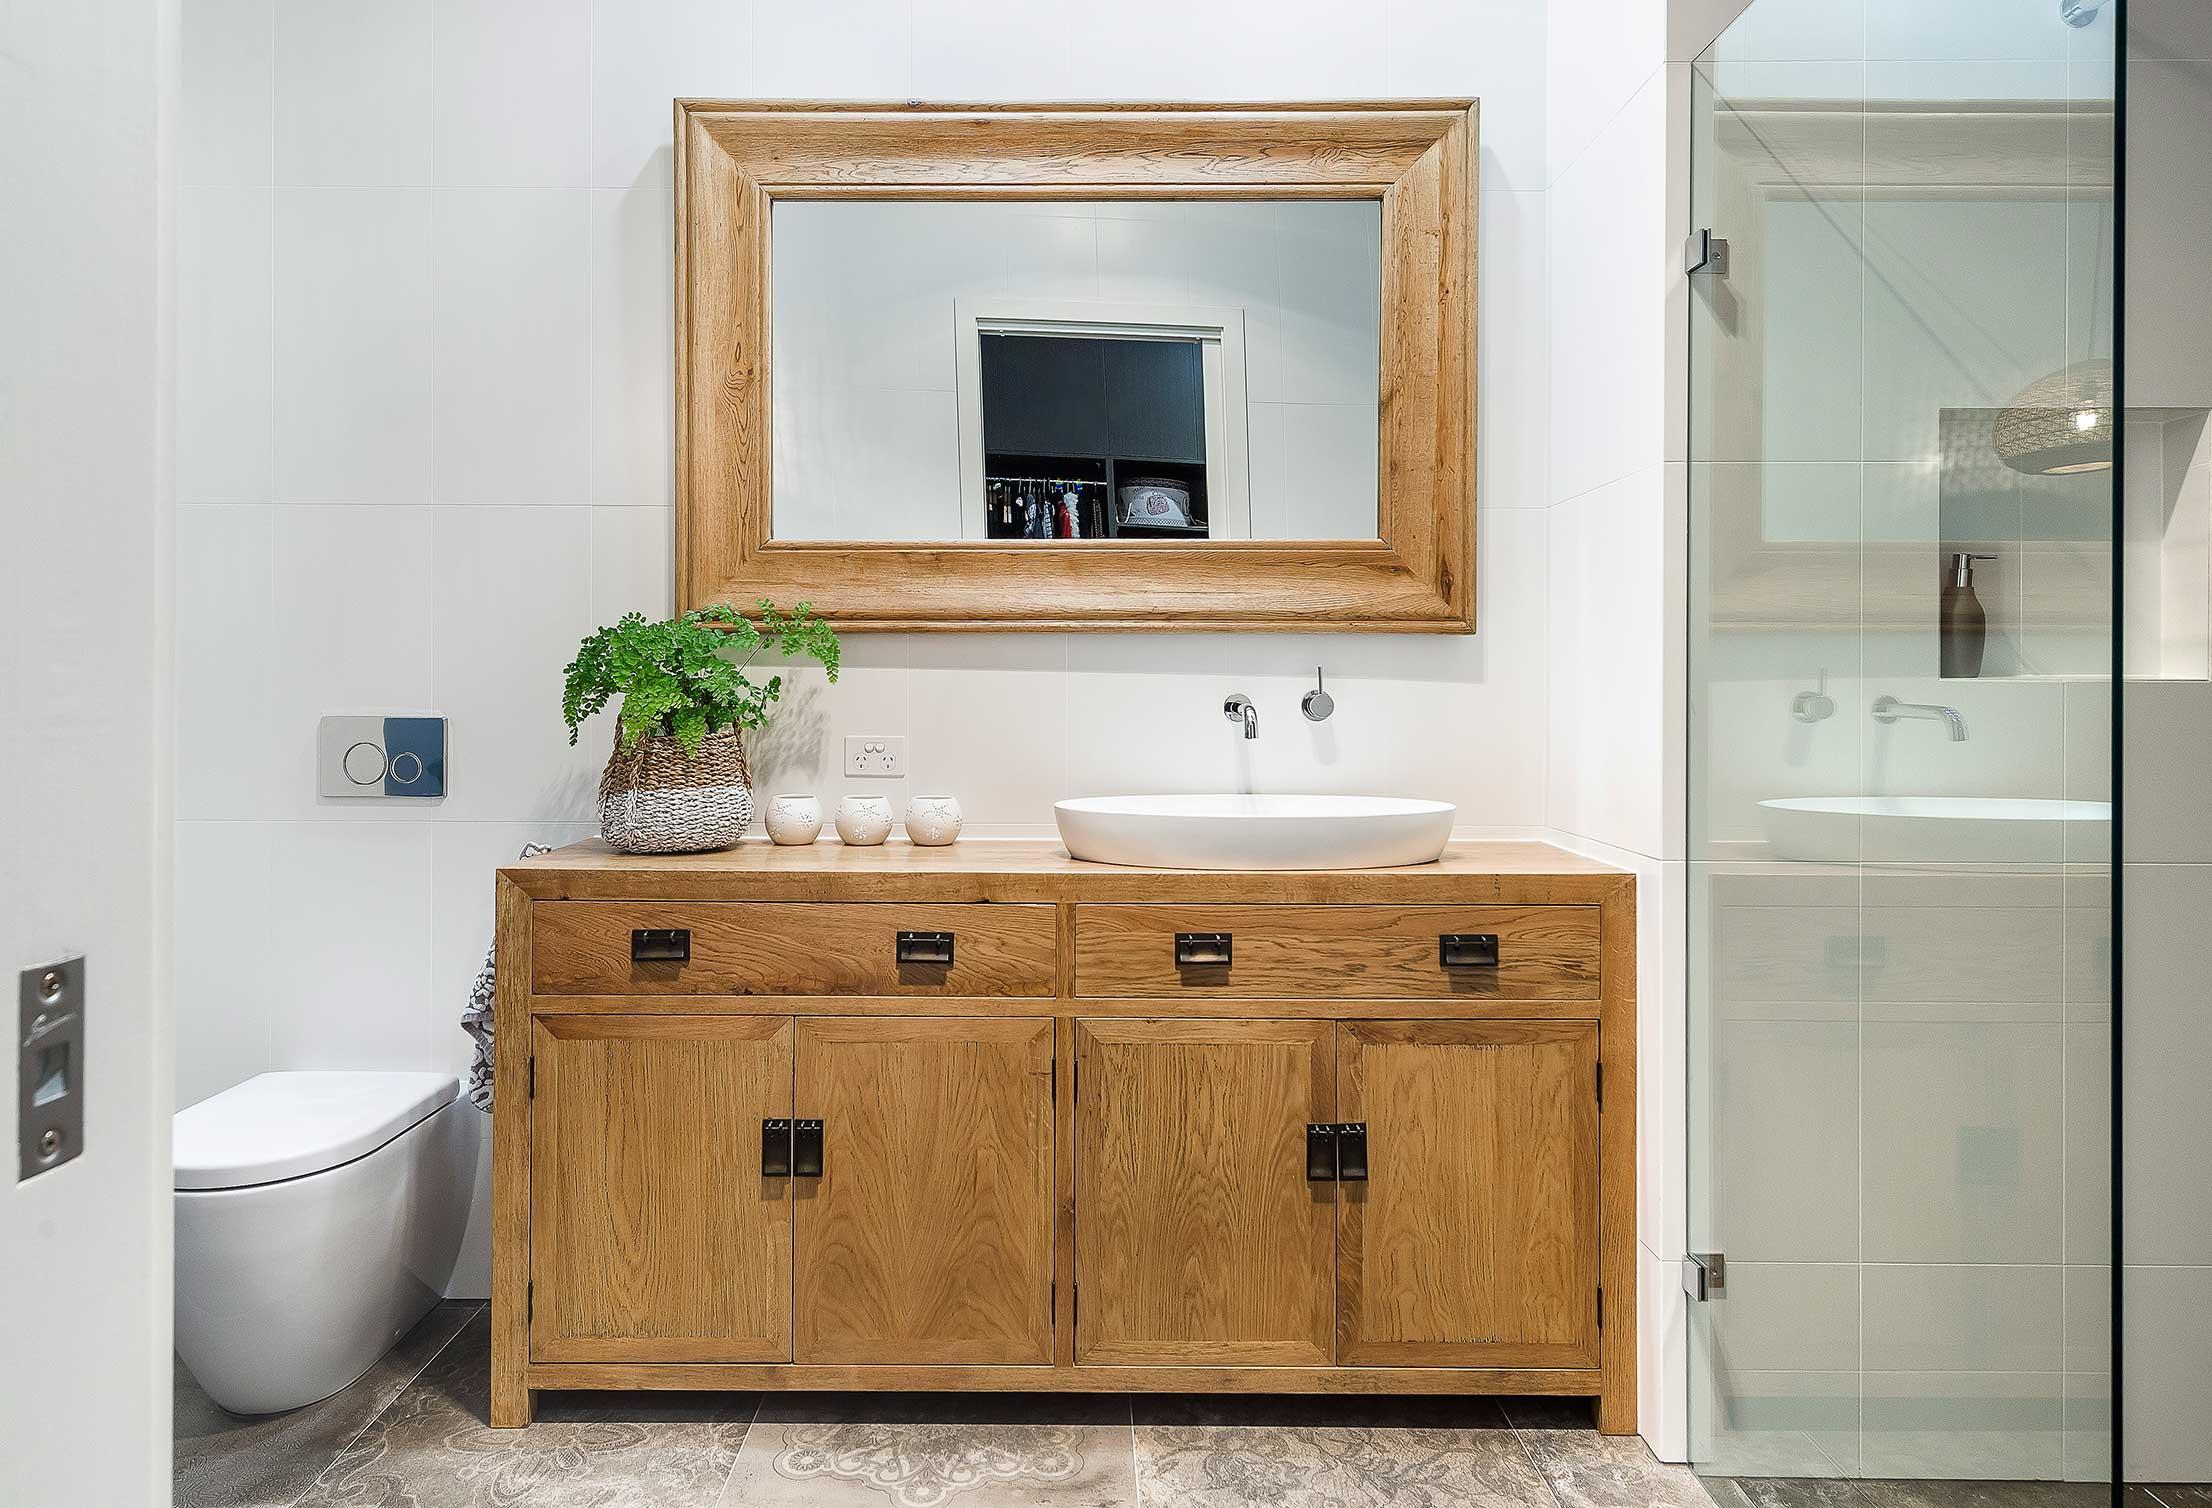 turnbull-built-bathroom-specialist-south-australia.jpg